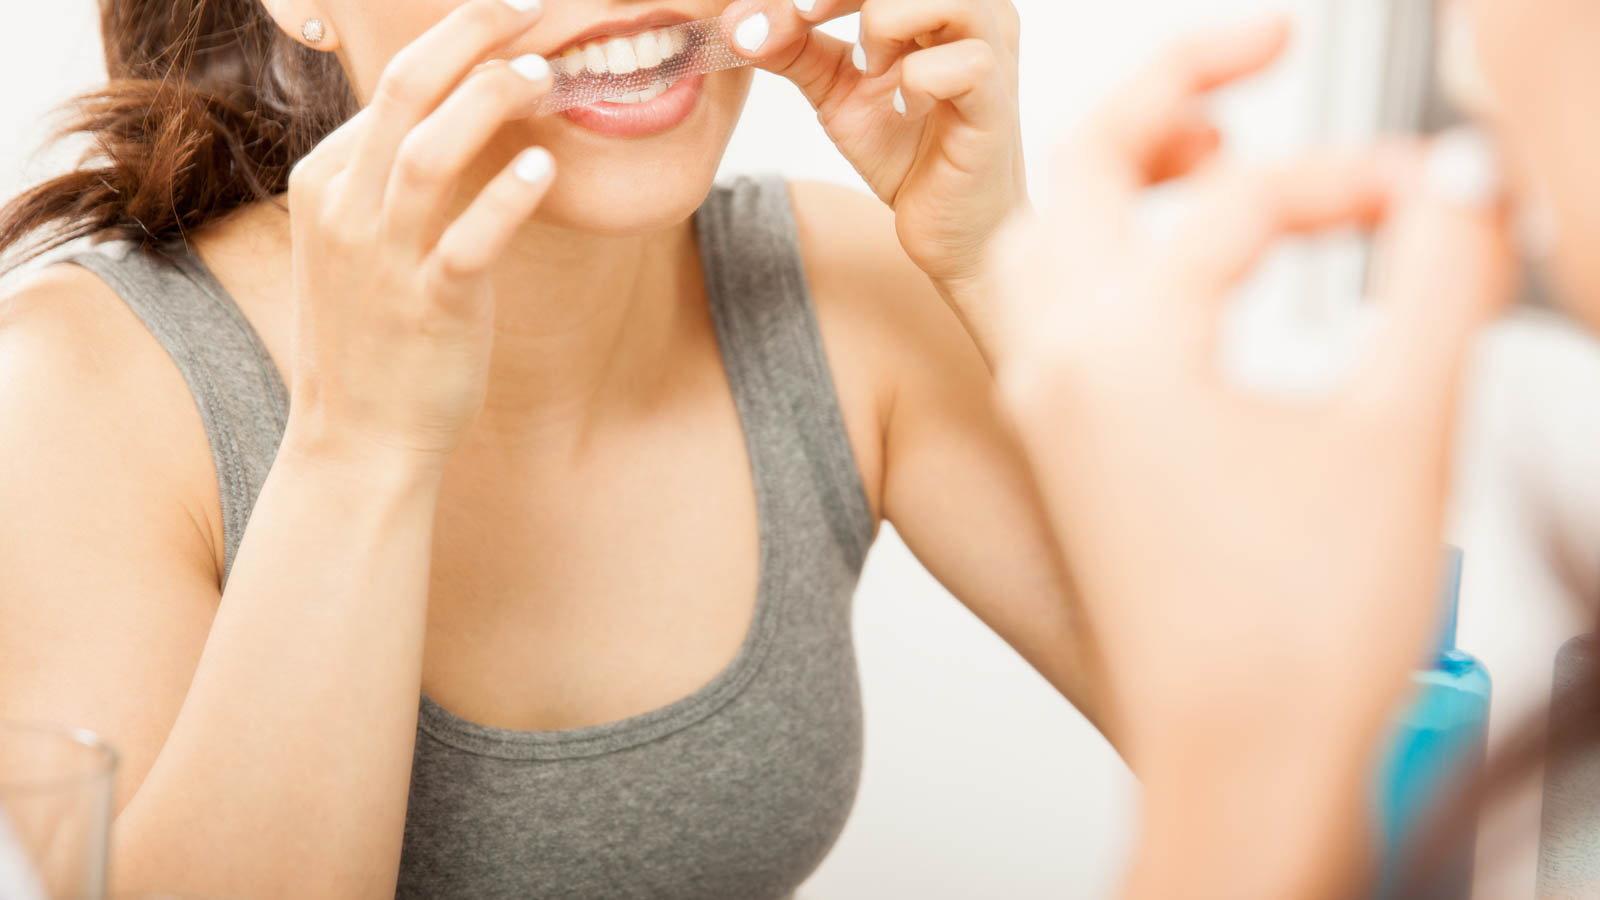 woman using a teeth whitening strip